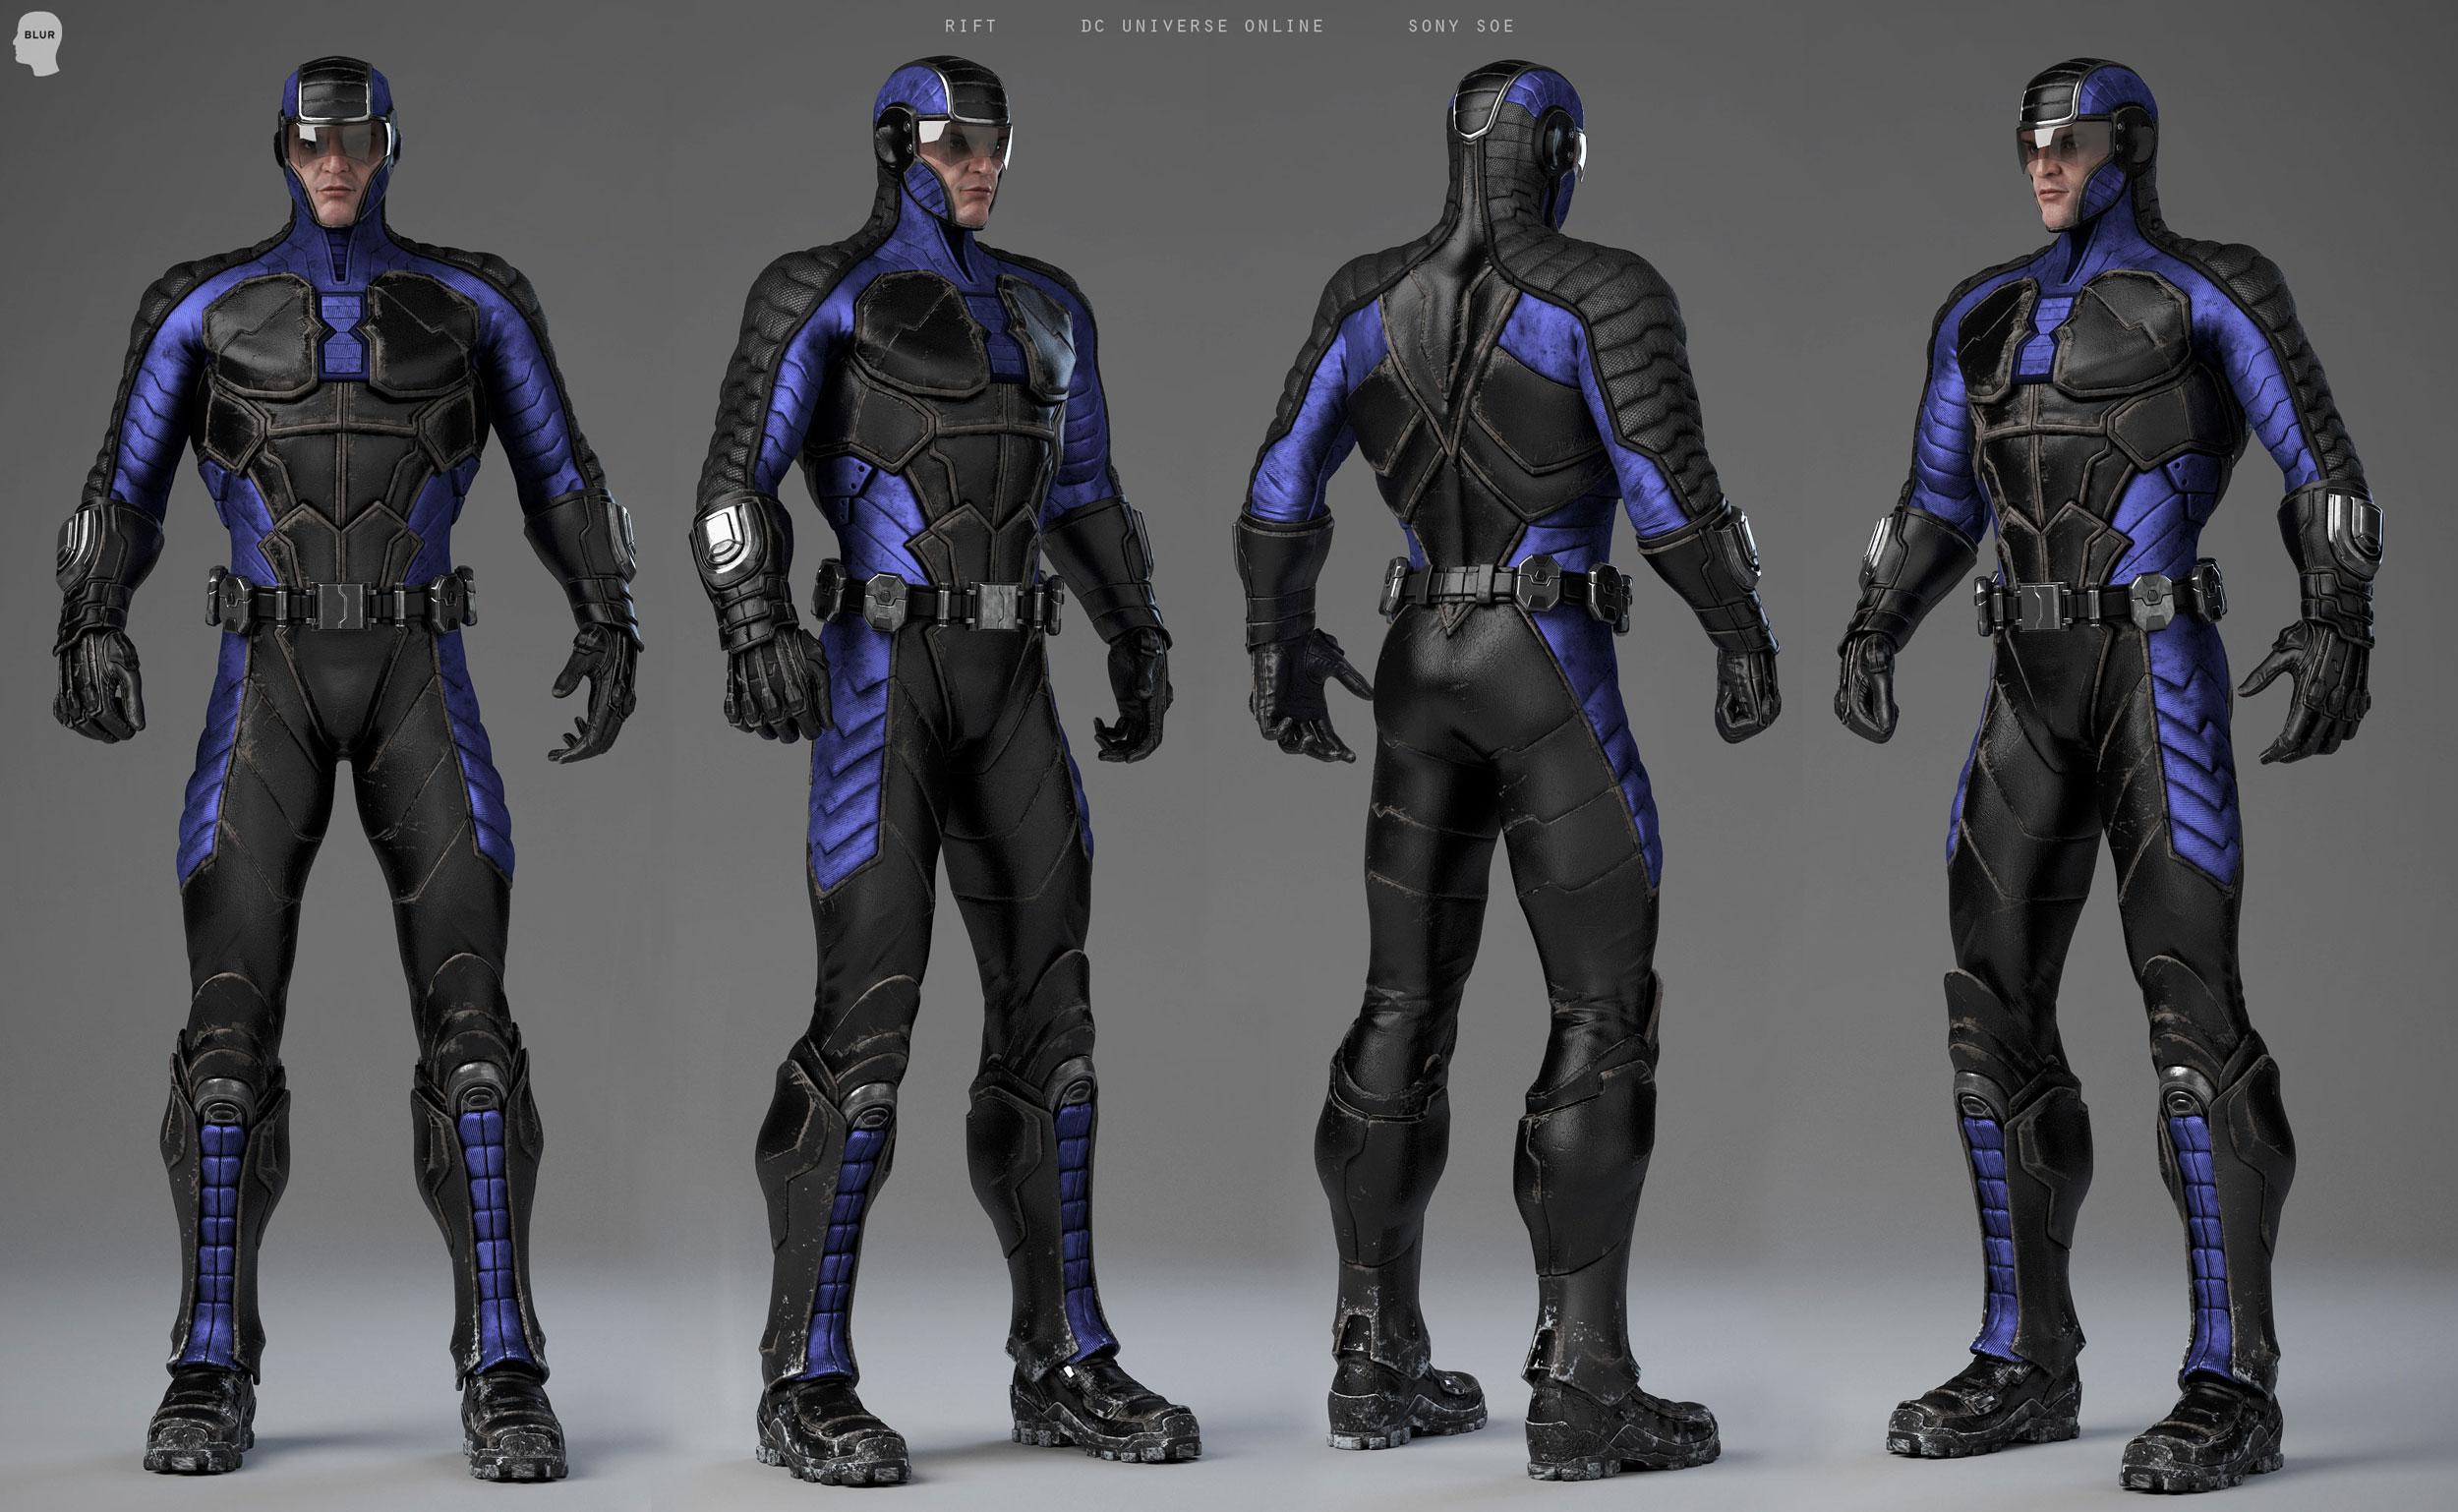 Image - Batman-dc-universe-online-1280x800.jpg | Heroes Wiki ...